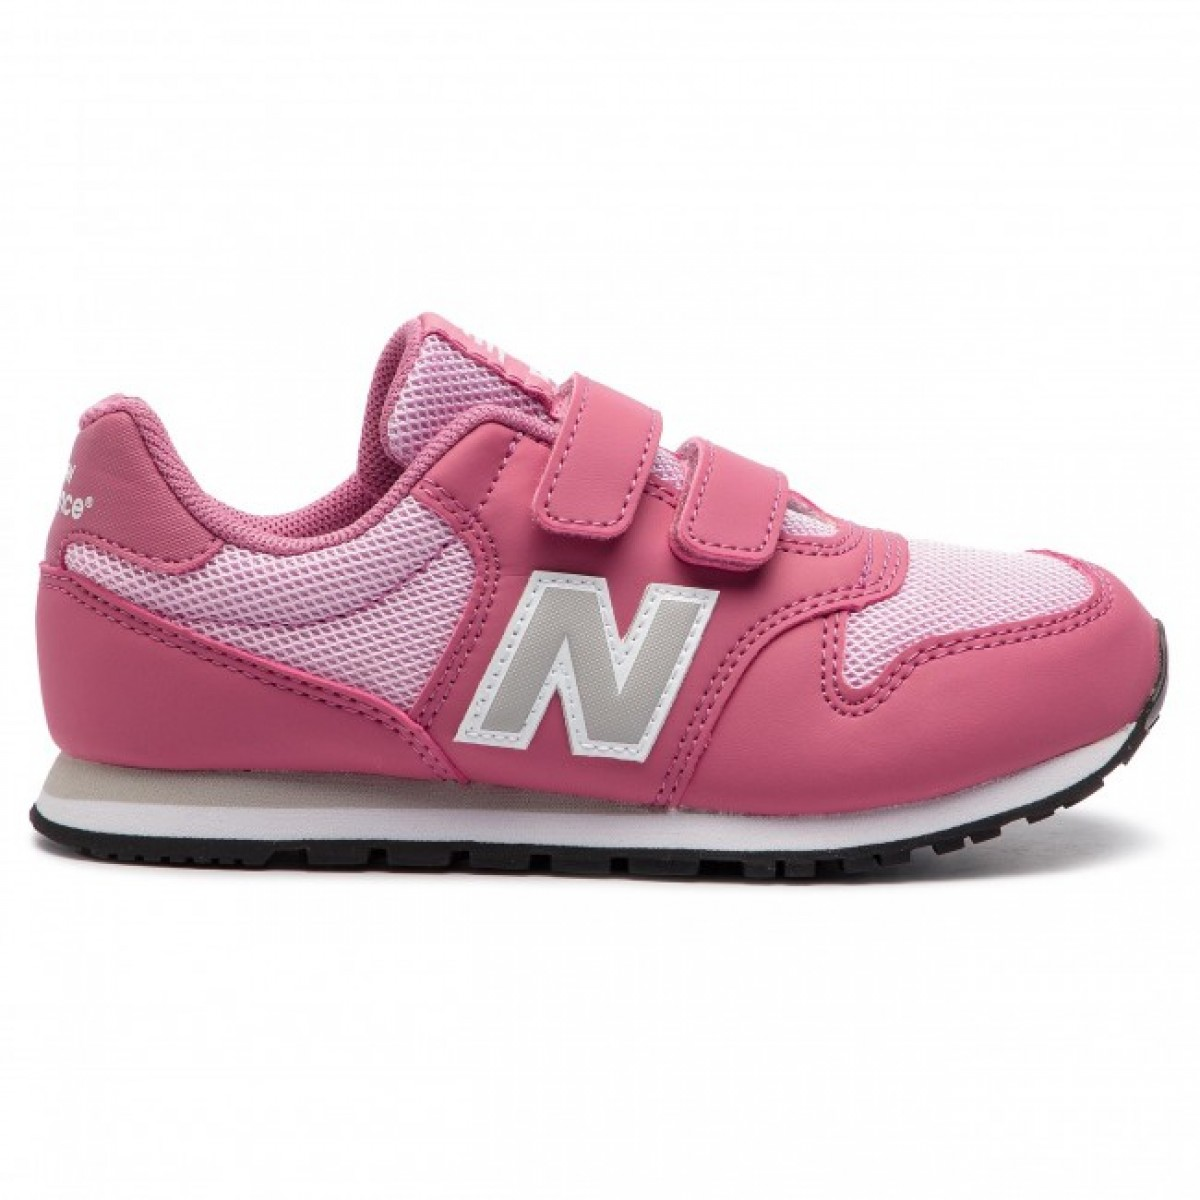 Sneakers New balance Bambino Yv500pk Mineral rose